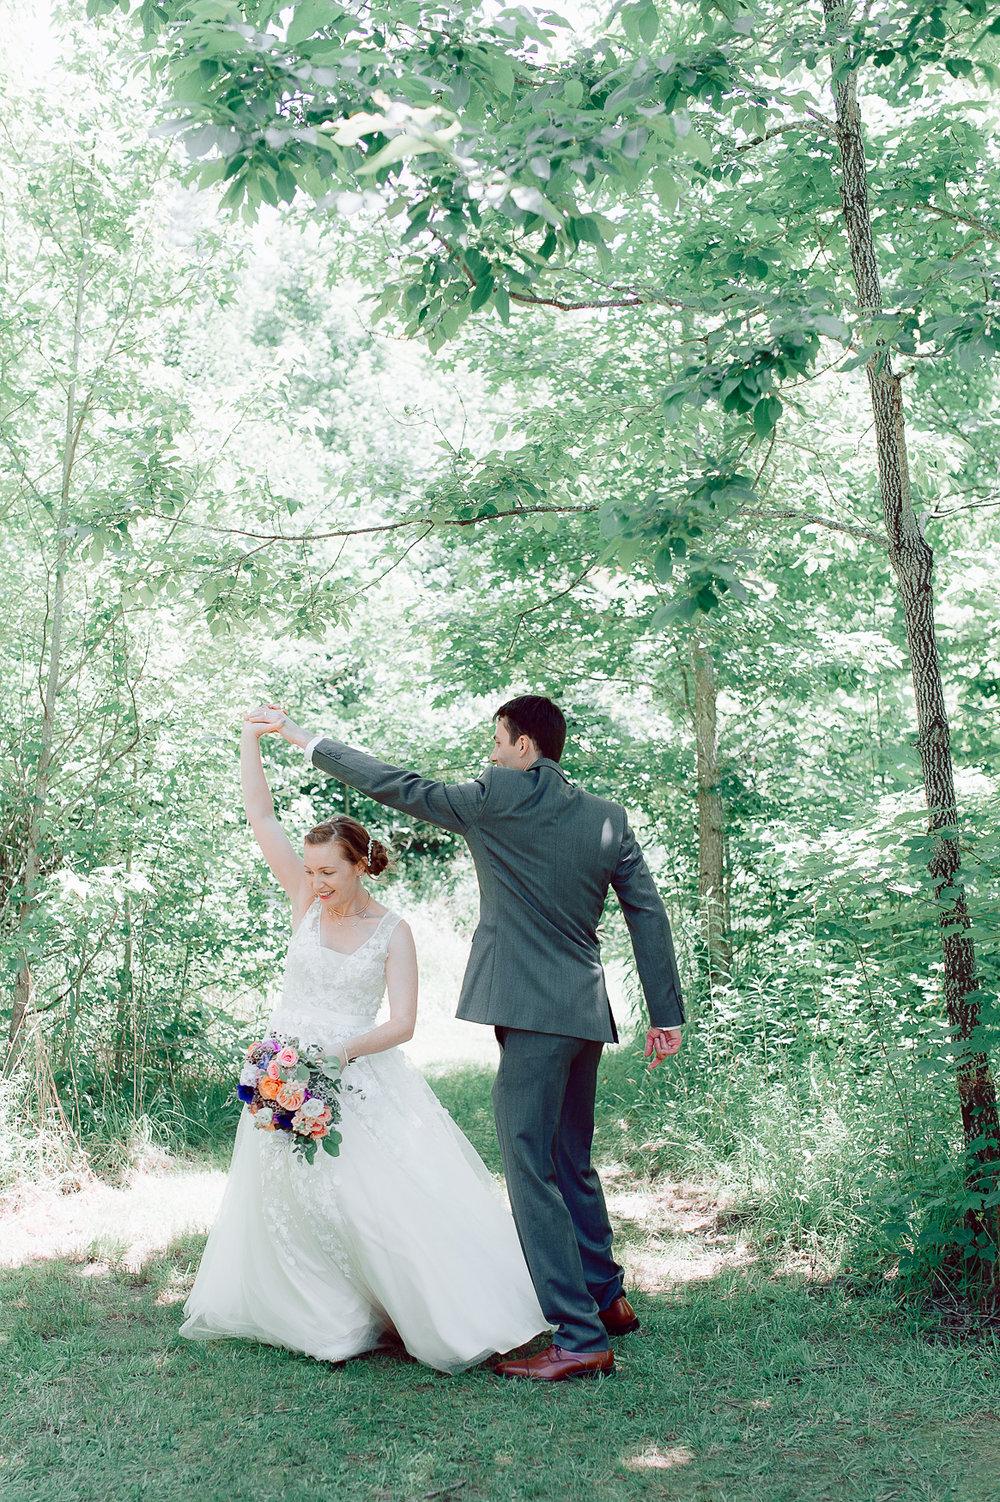 virginiawedding_theGlasgowFarm_rusticwedding_fredericksburg_youseephotography_CarolineDale (53).jpg